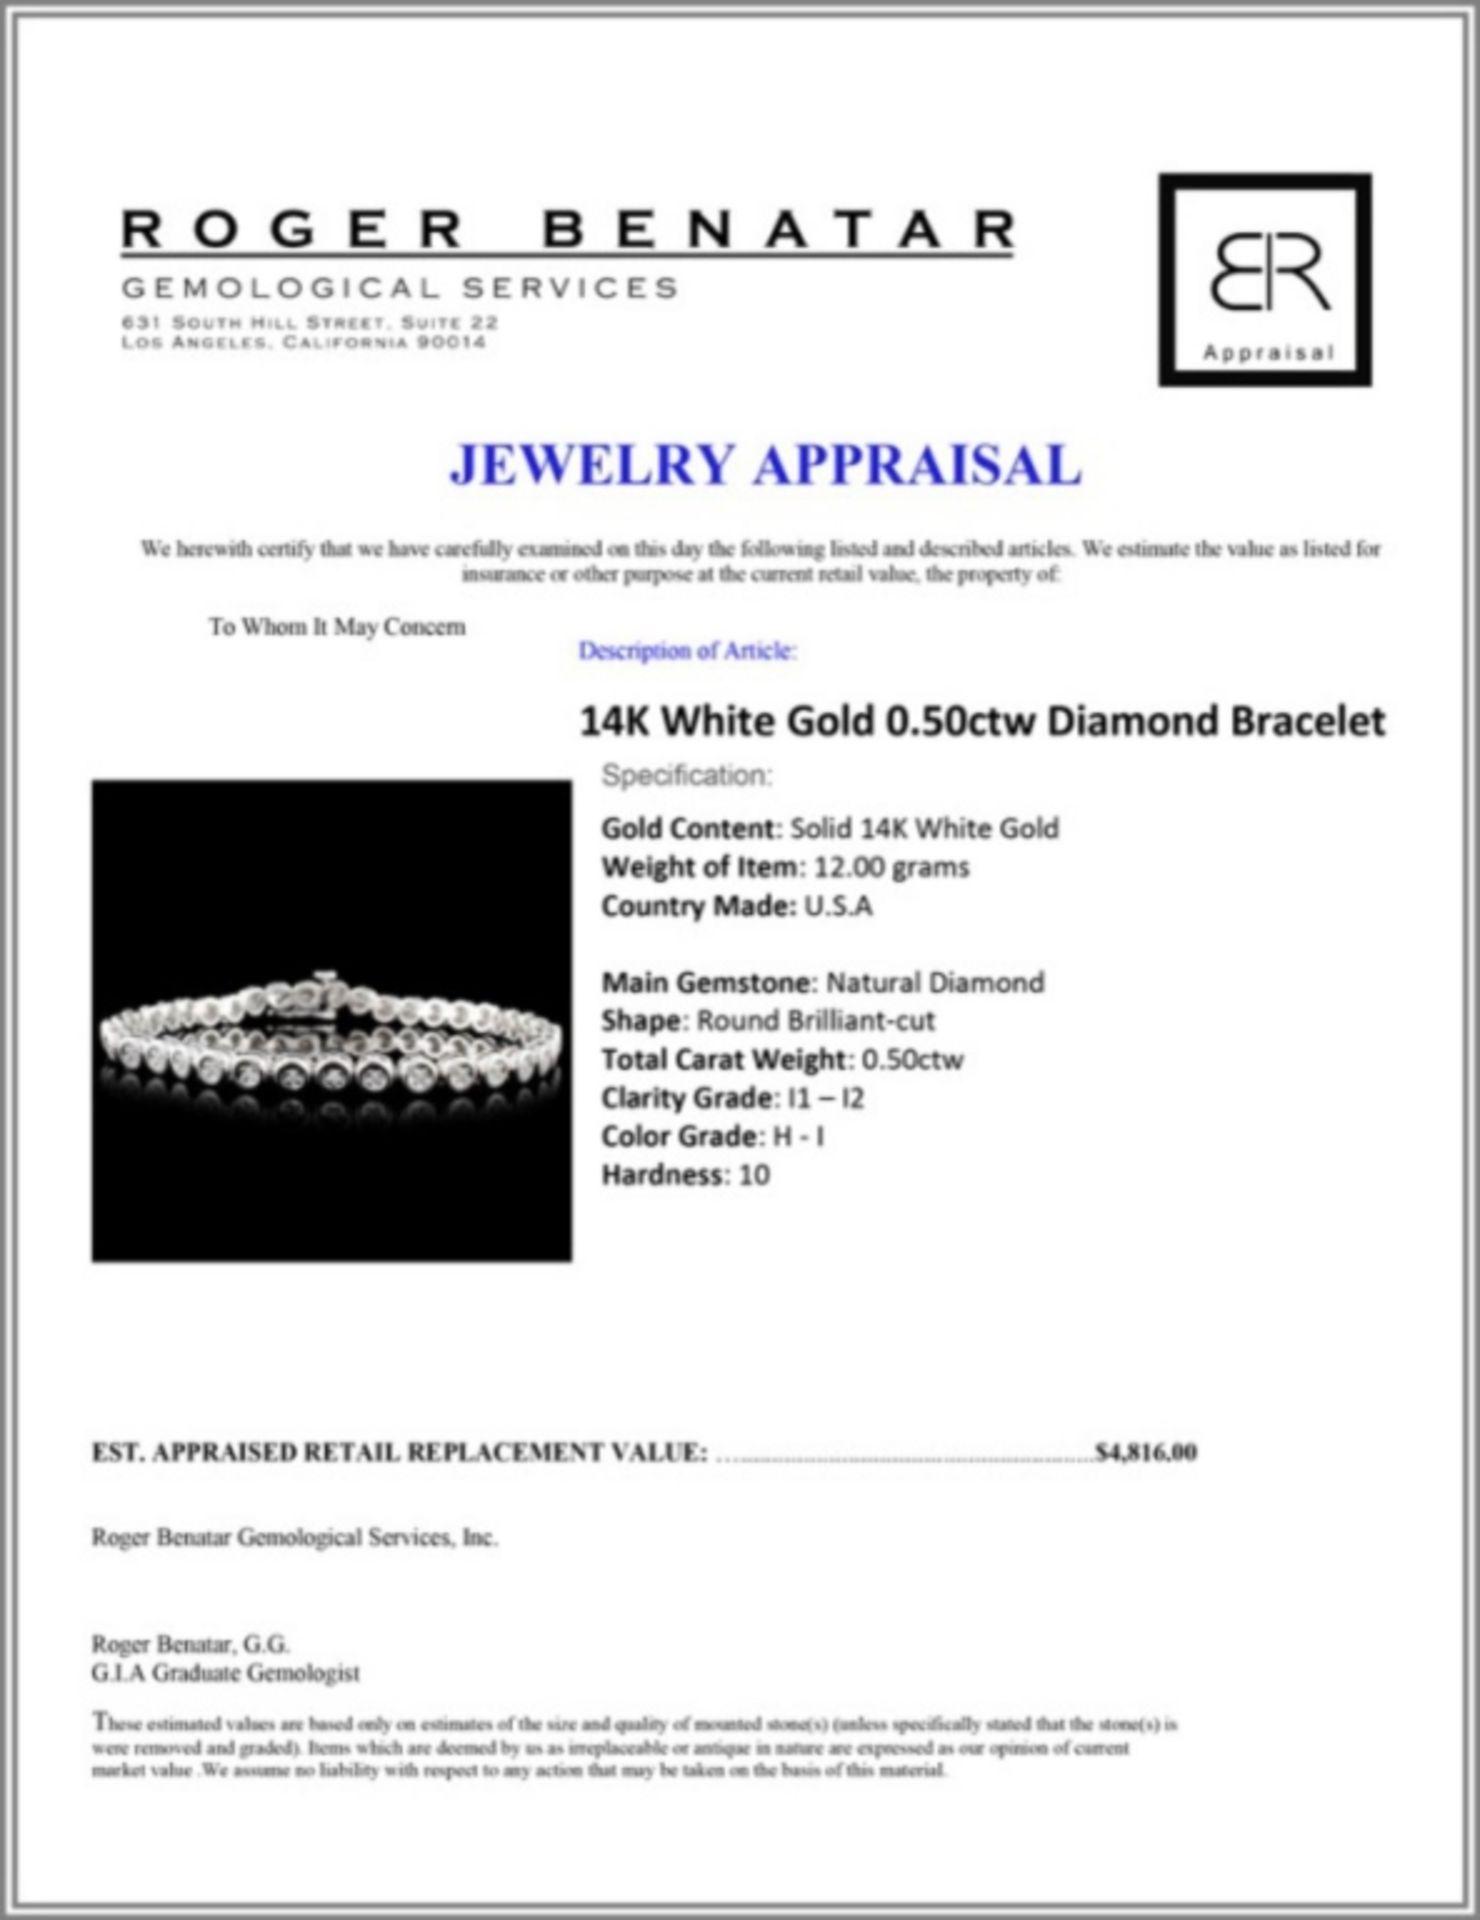 14K White Gold 0.50ctw Diamond Bracelet - Image 3 of 3